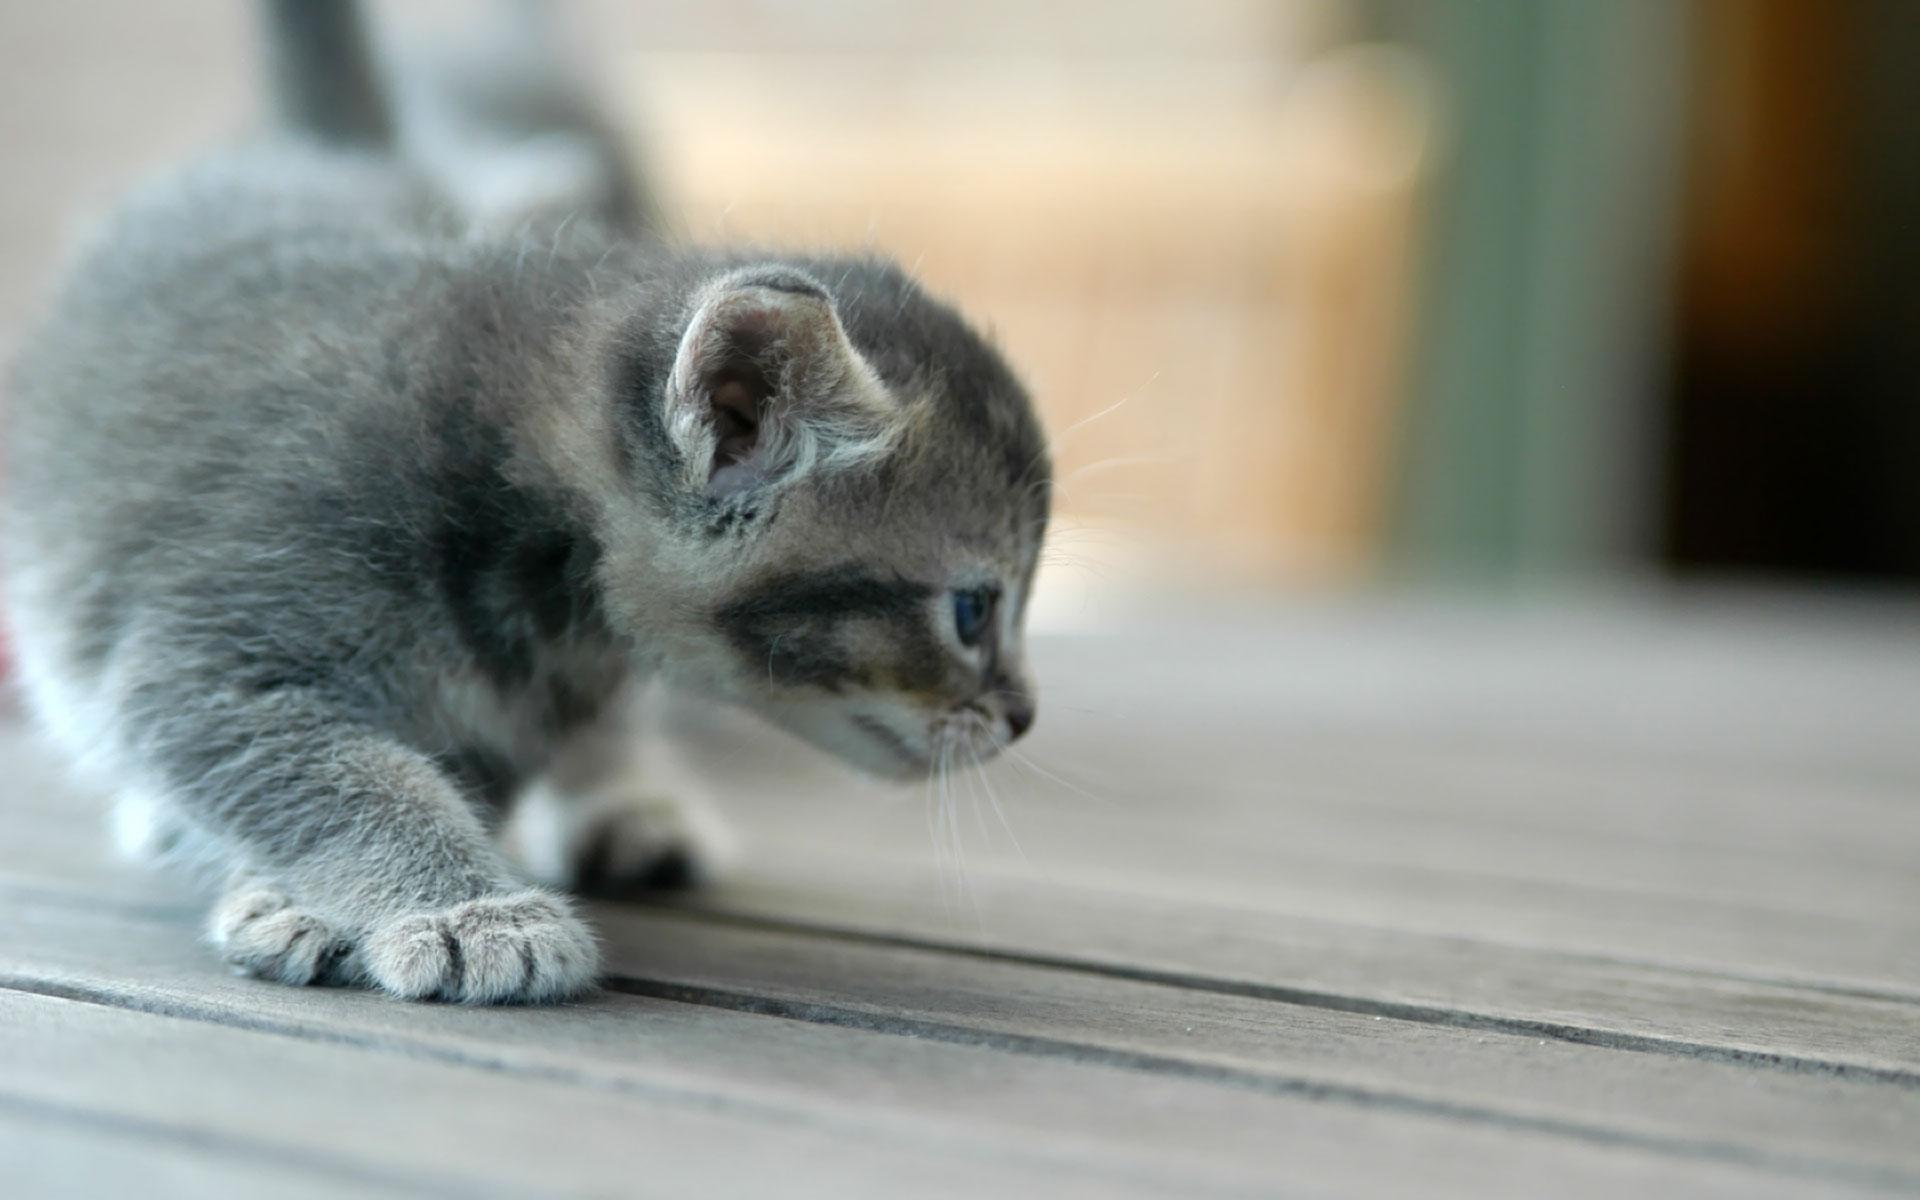 Images fonds d ecrans chiens et chats page 4 - Cute kittens hd wallpaper free download ...